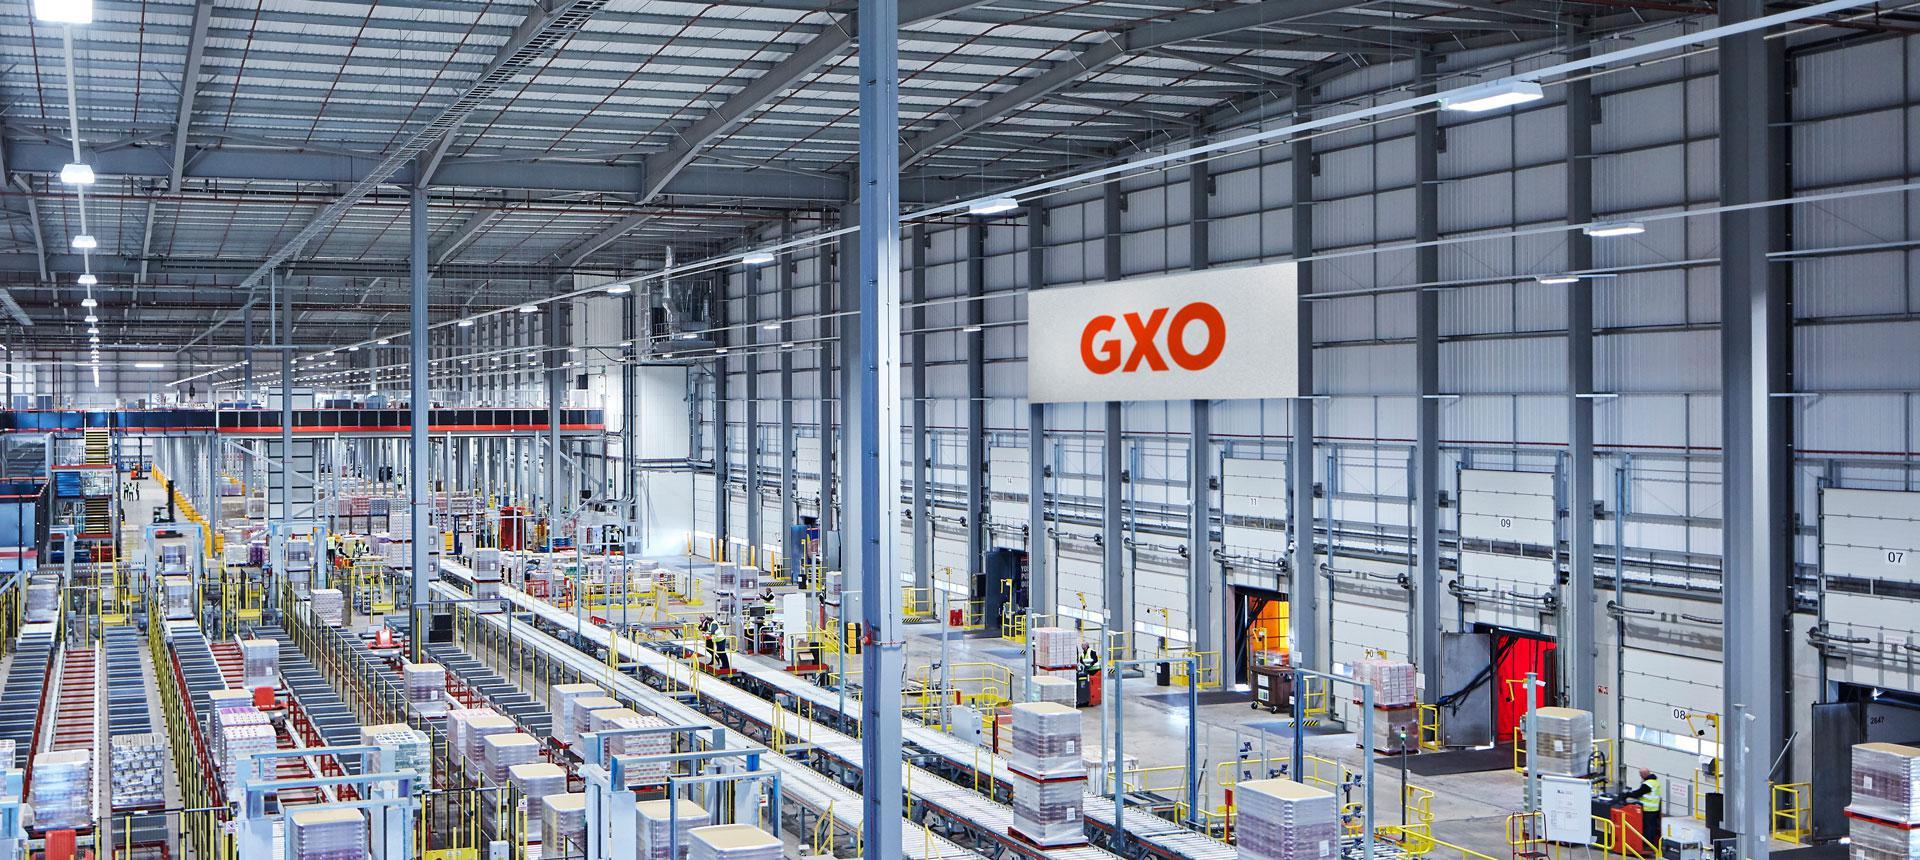 GXO warehouse